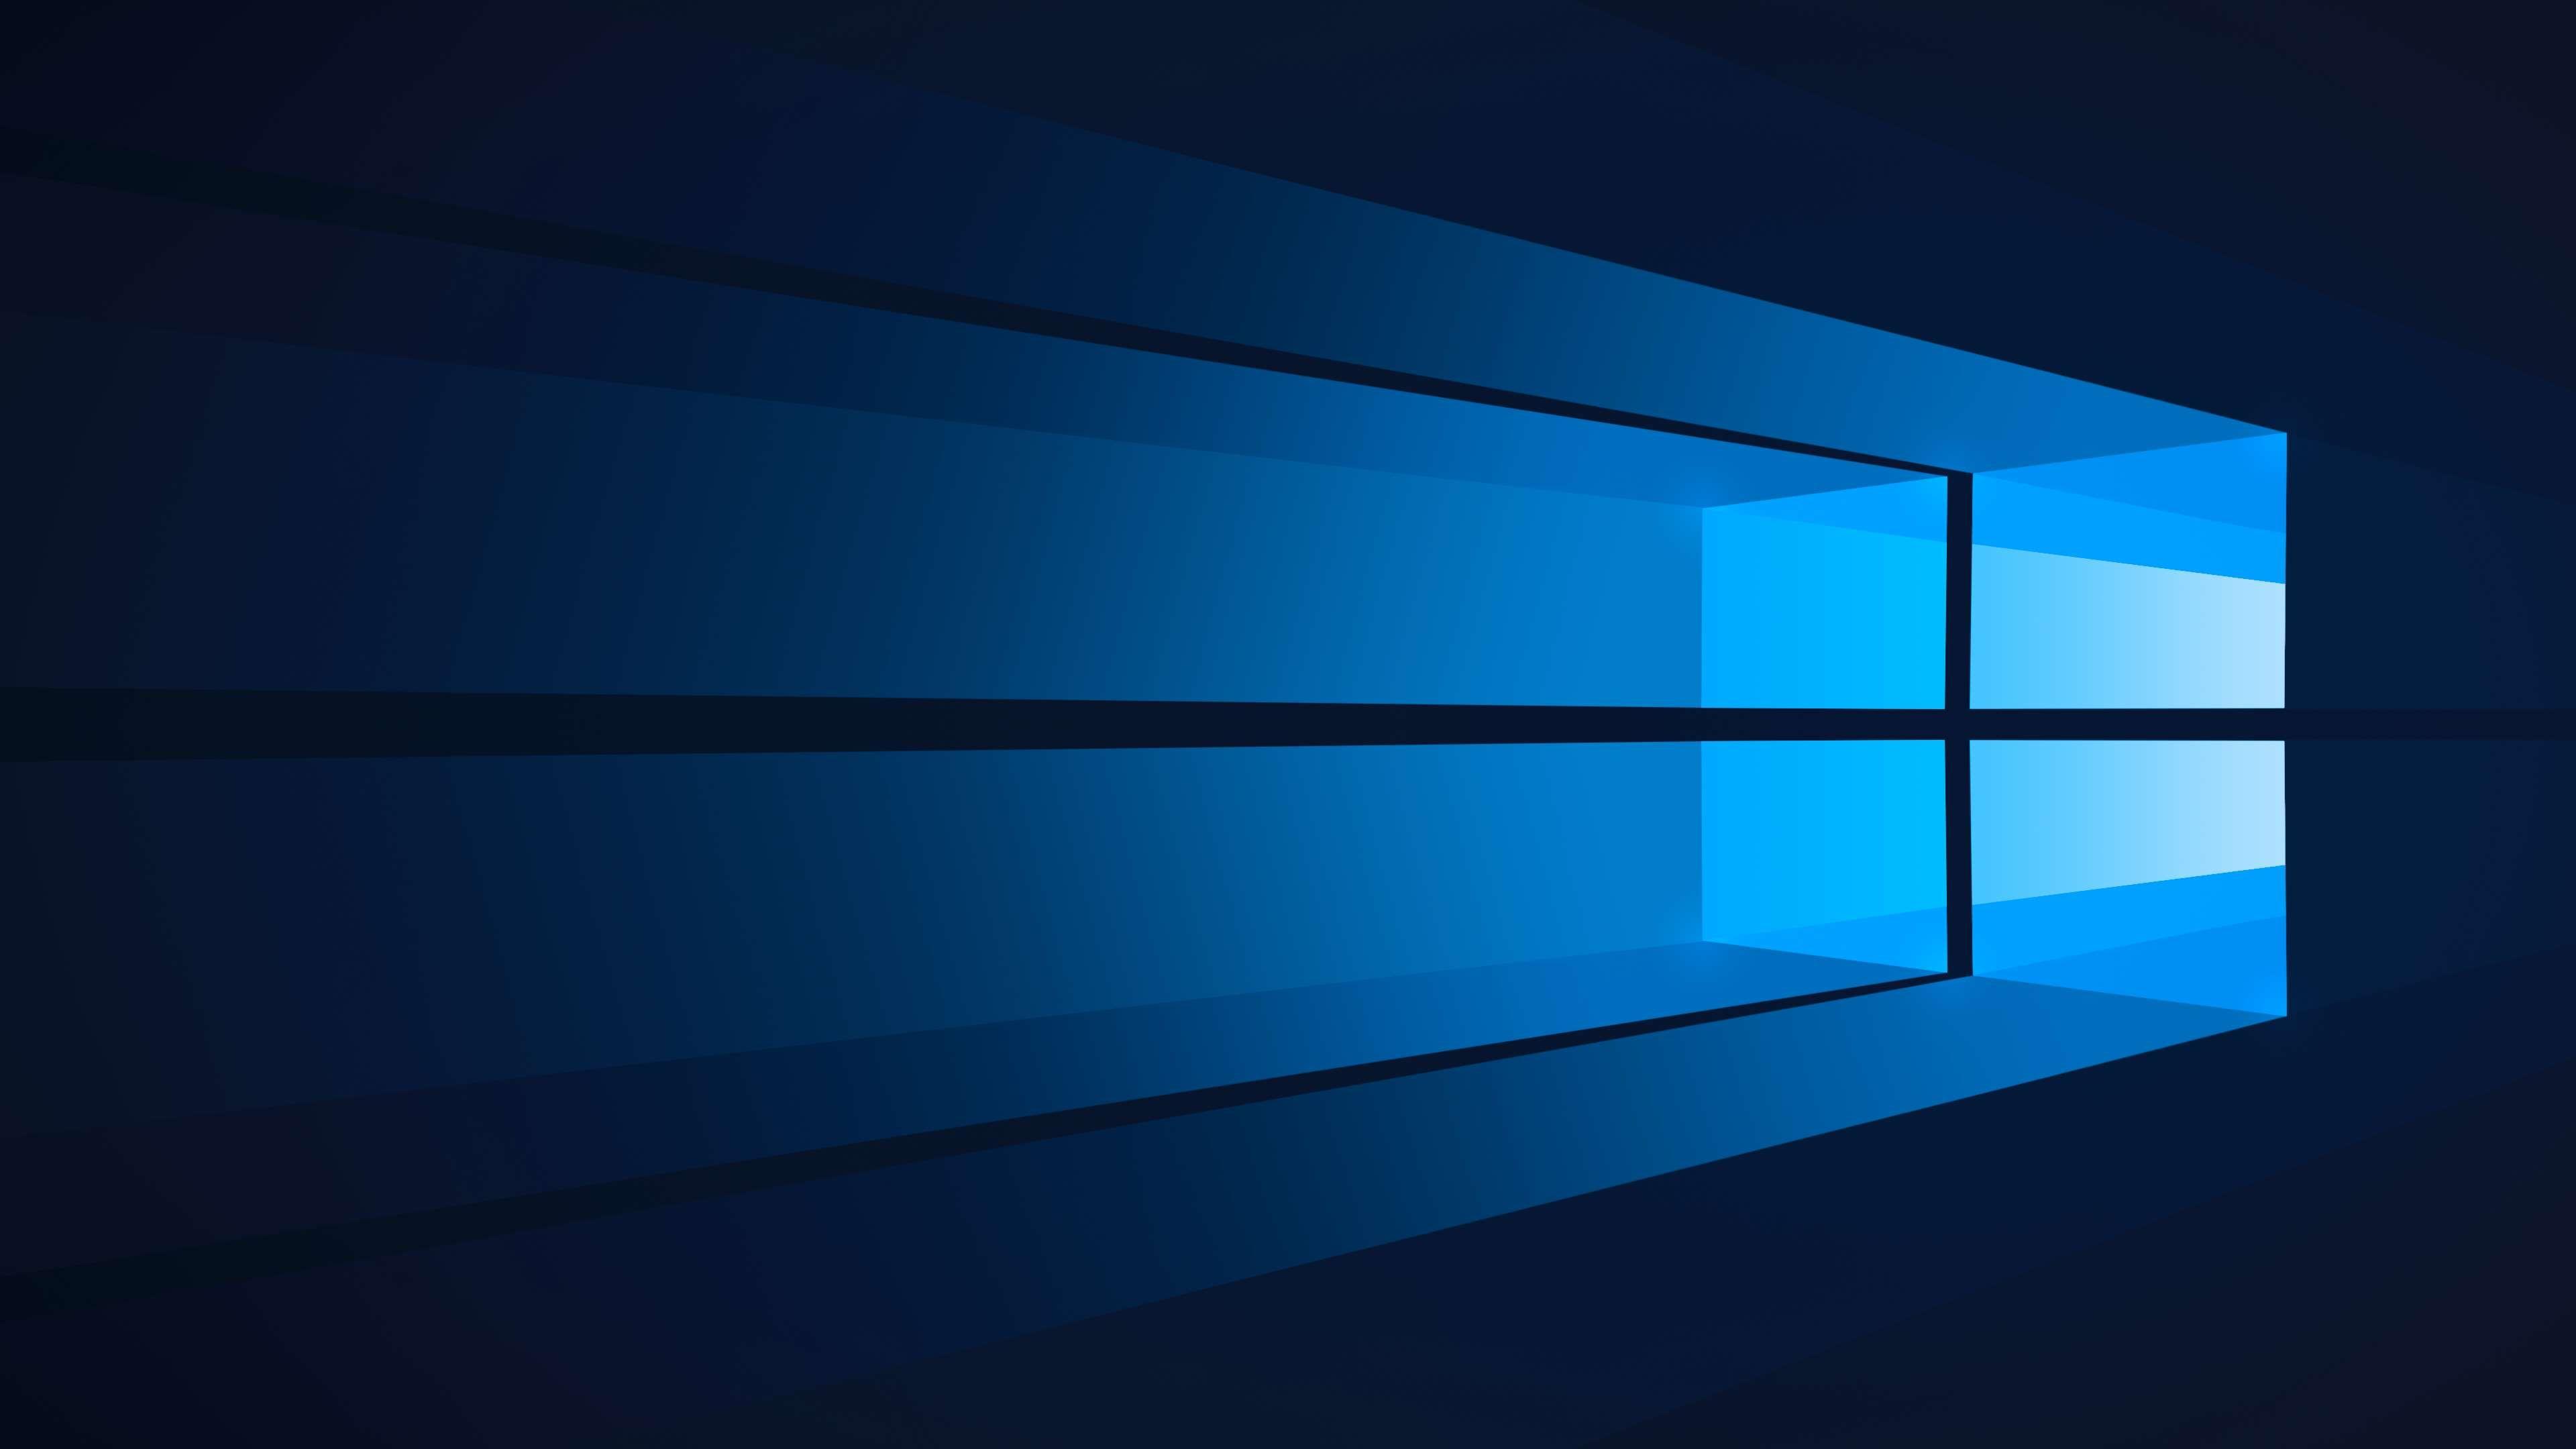 Windows 10 Blue Wallpaper 4k